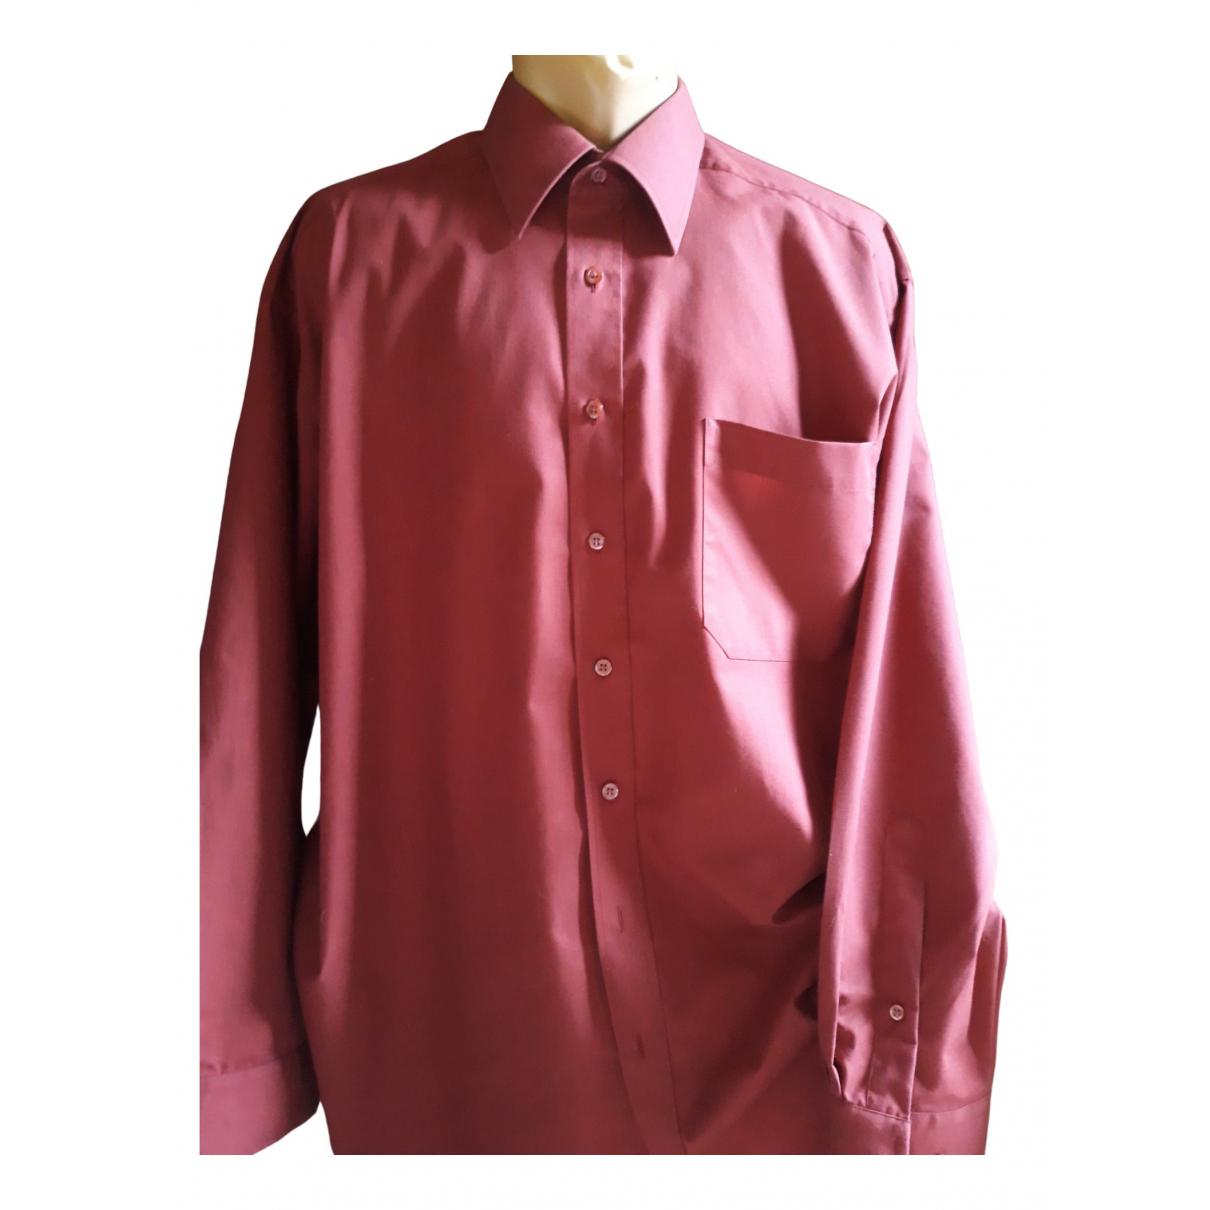 Paul Smith \N Burgundy Cotton Shirts for Men 44 EU (tour de cou / collar)